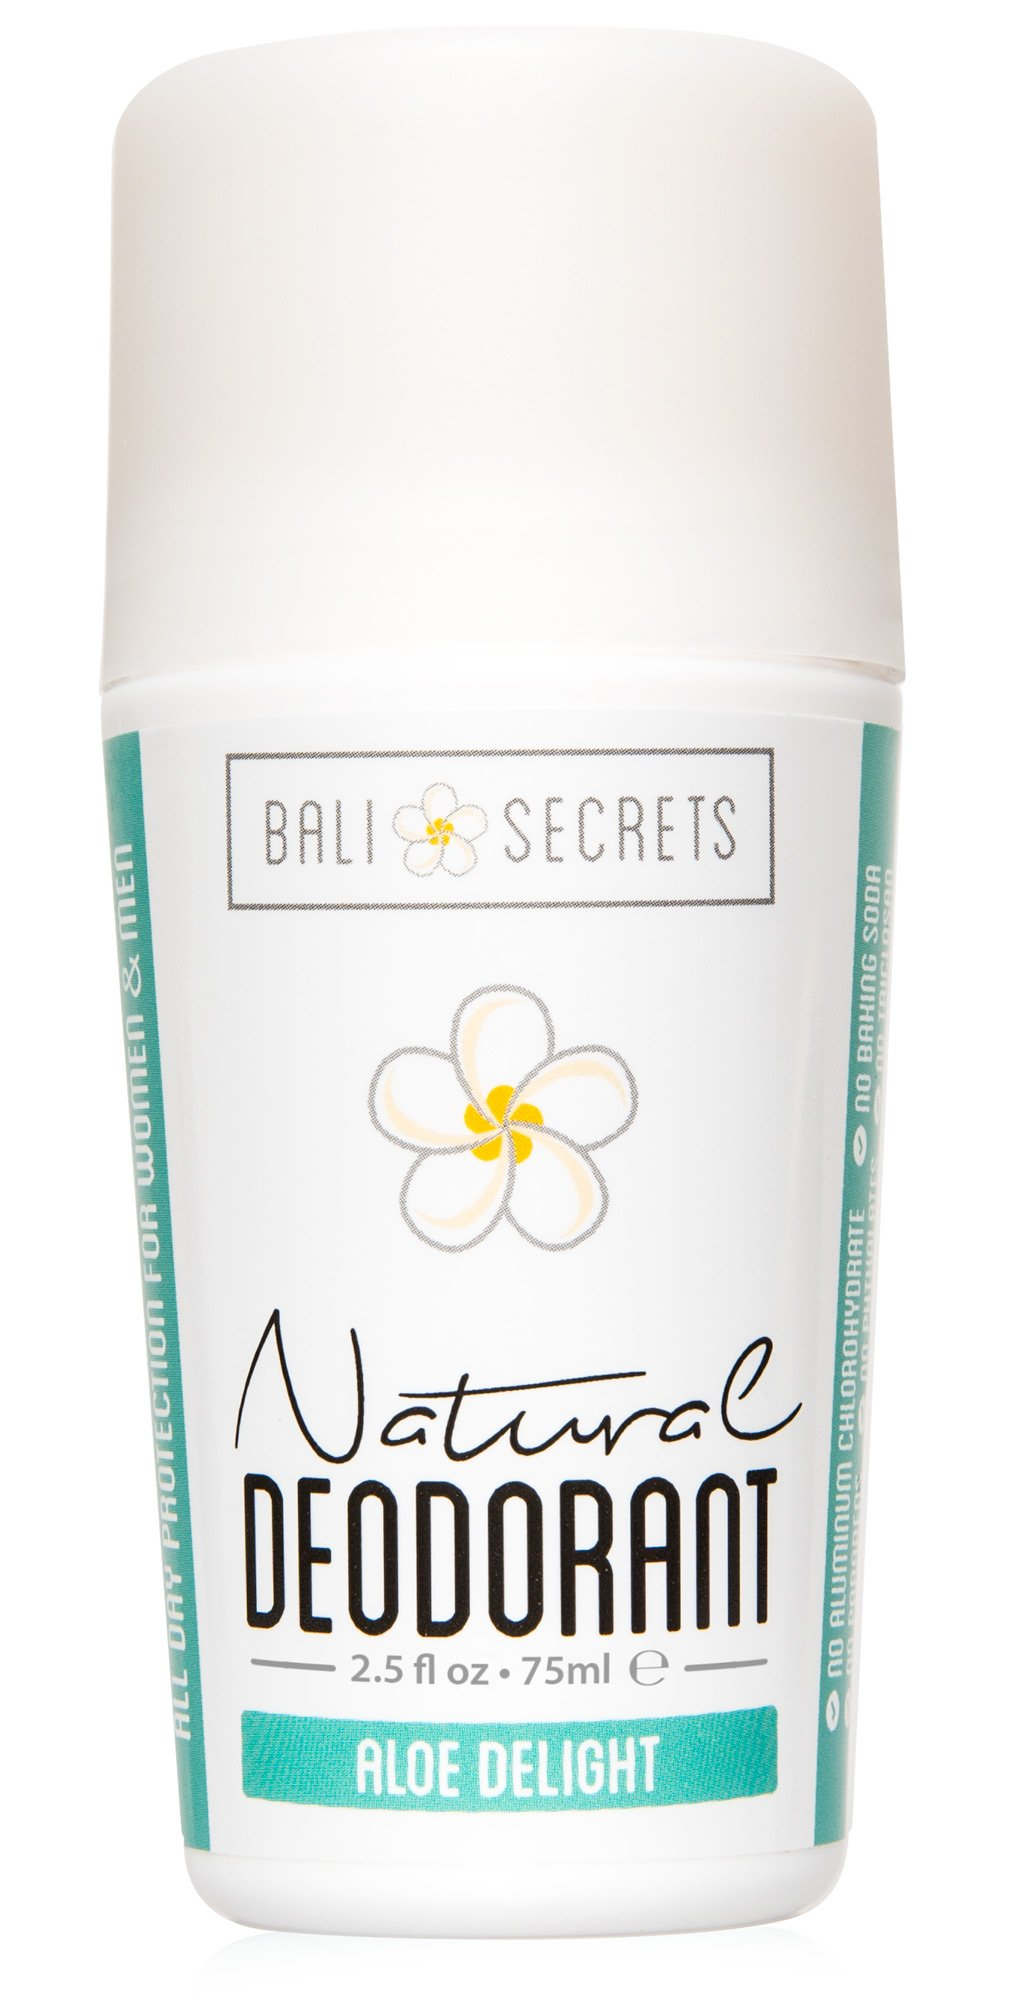 Bali Secrets Natural Deodorant - Organic & Vegan - For Women & Men - All Day Fresh - Strong & Reliable Protection - 2.5 fl.oz/75ml [Scent: Aloe Delight]